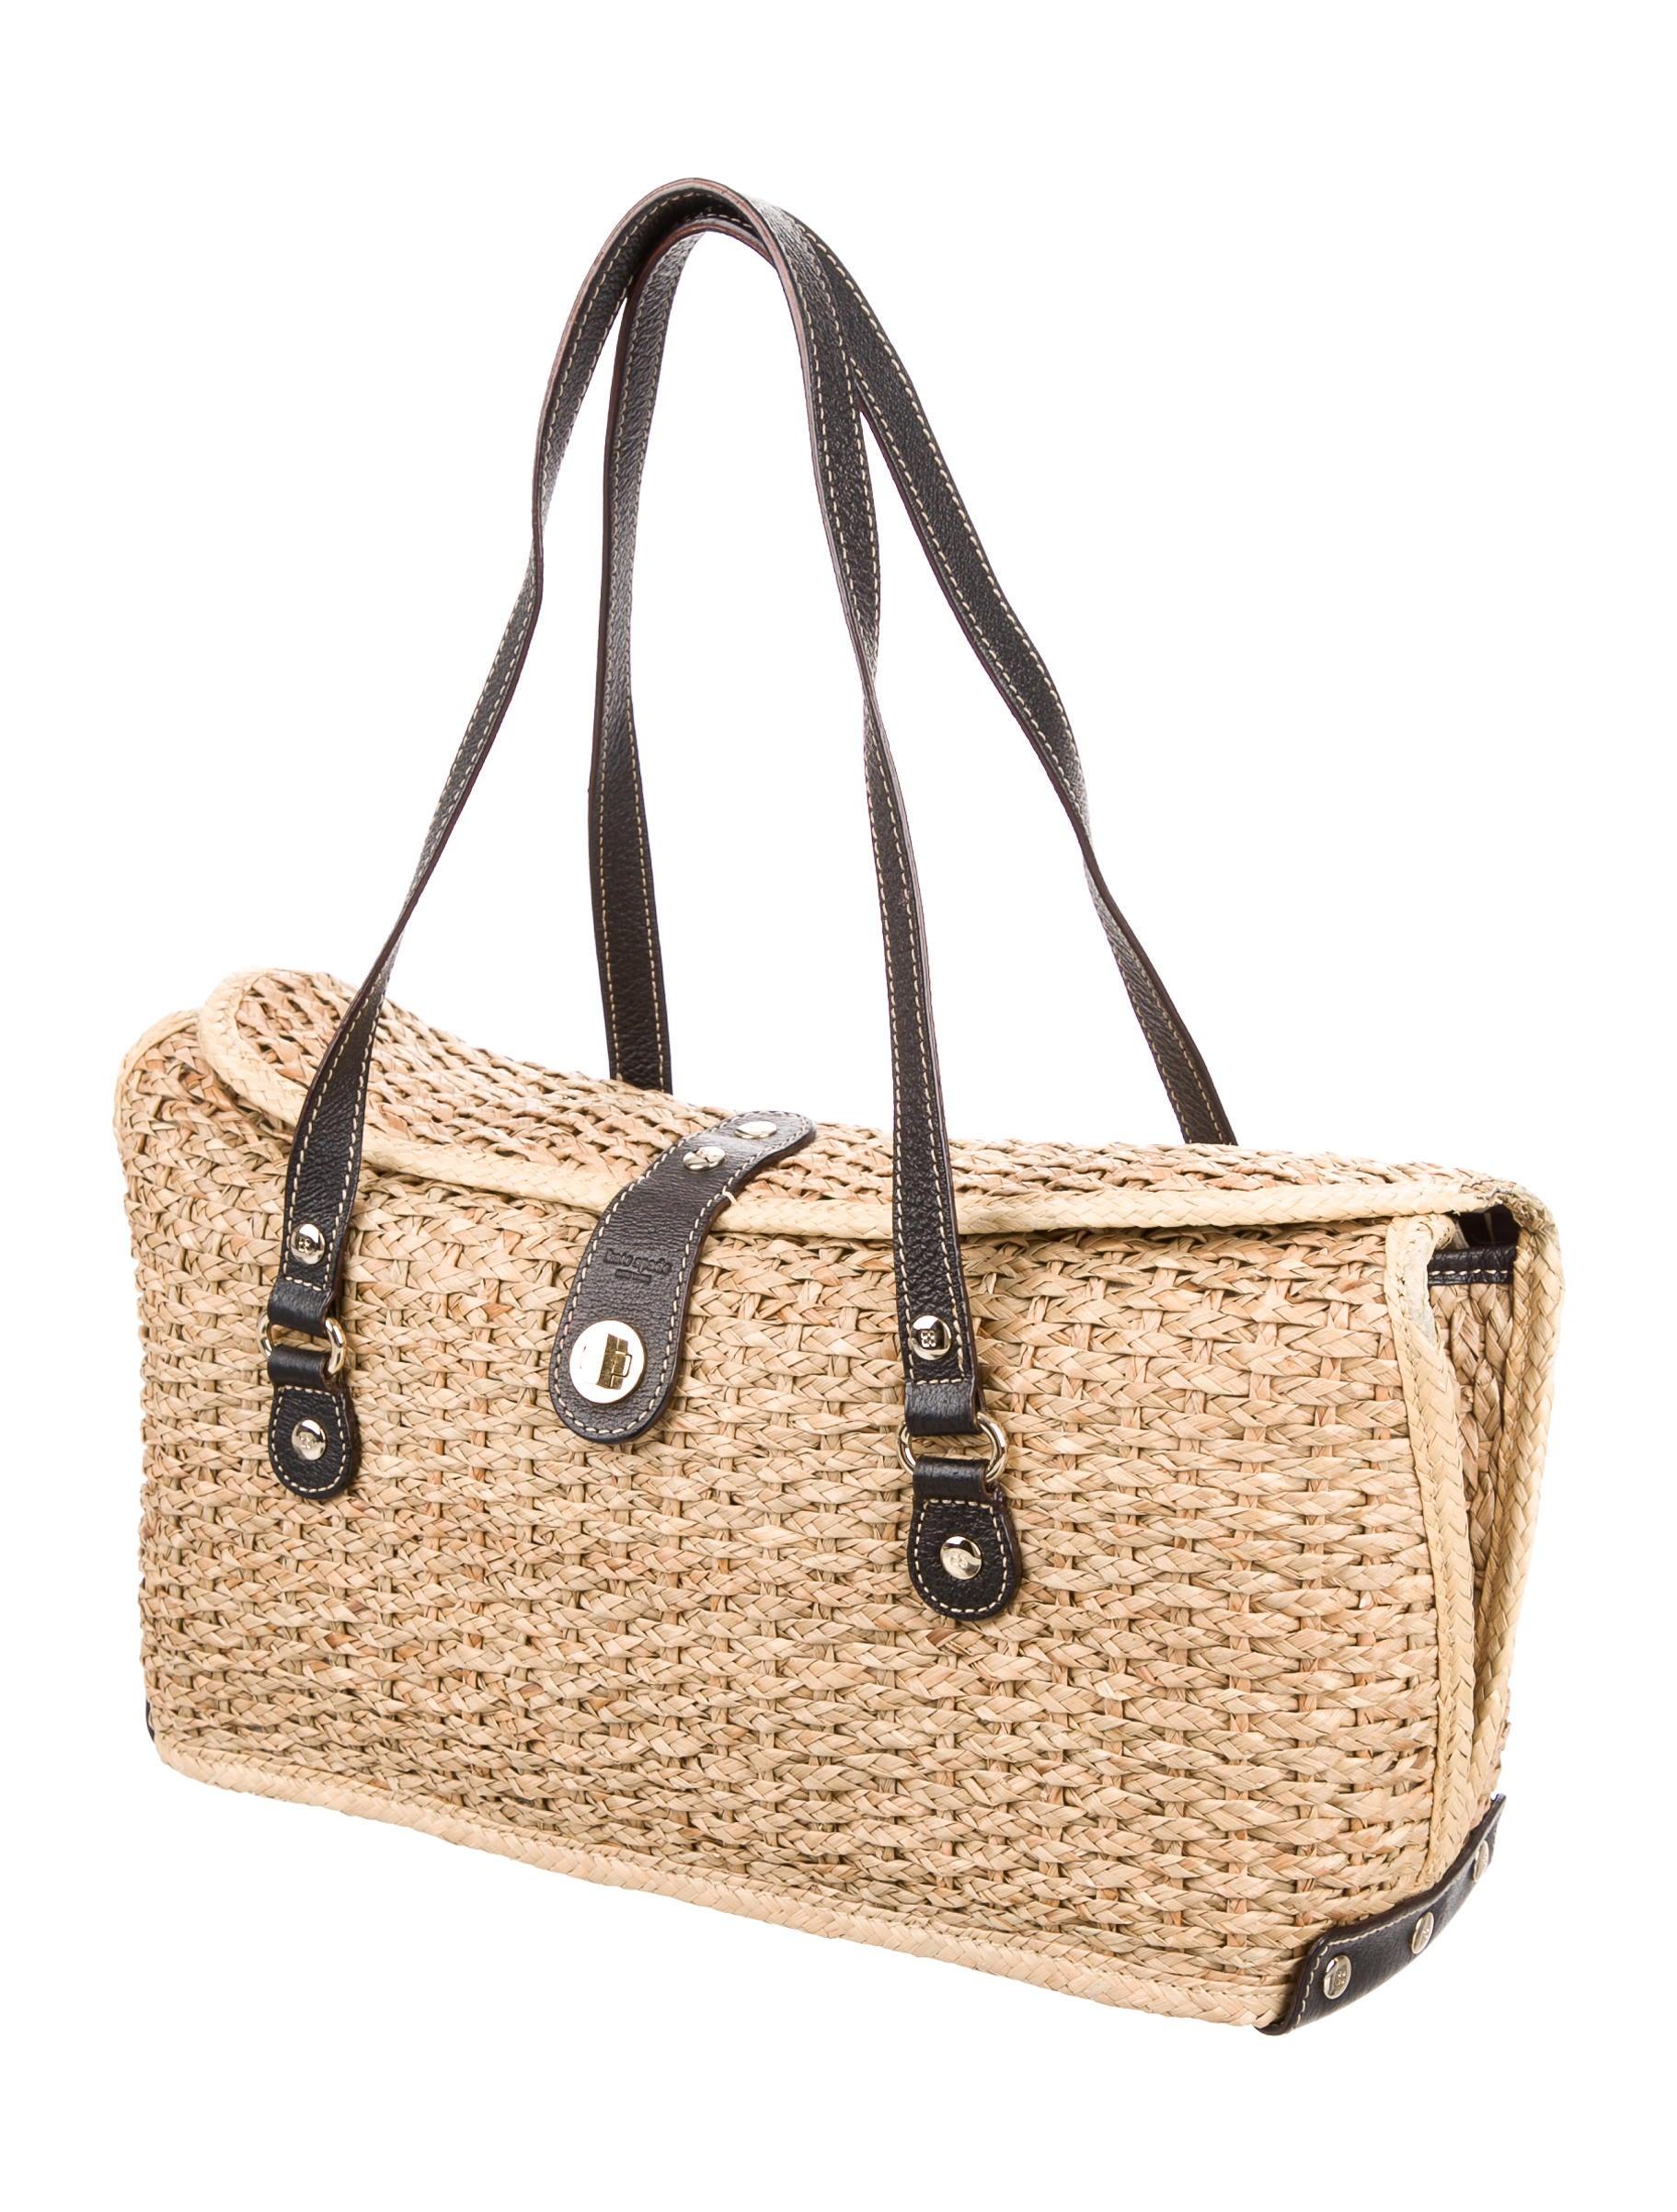 Kate Spade New York Riviera Straw E W Satchel Handbags